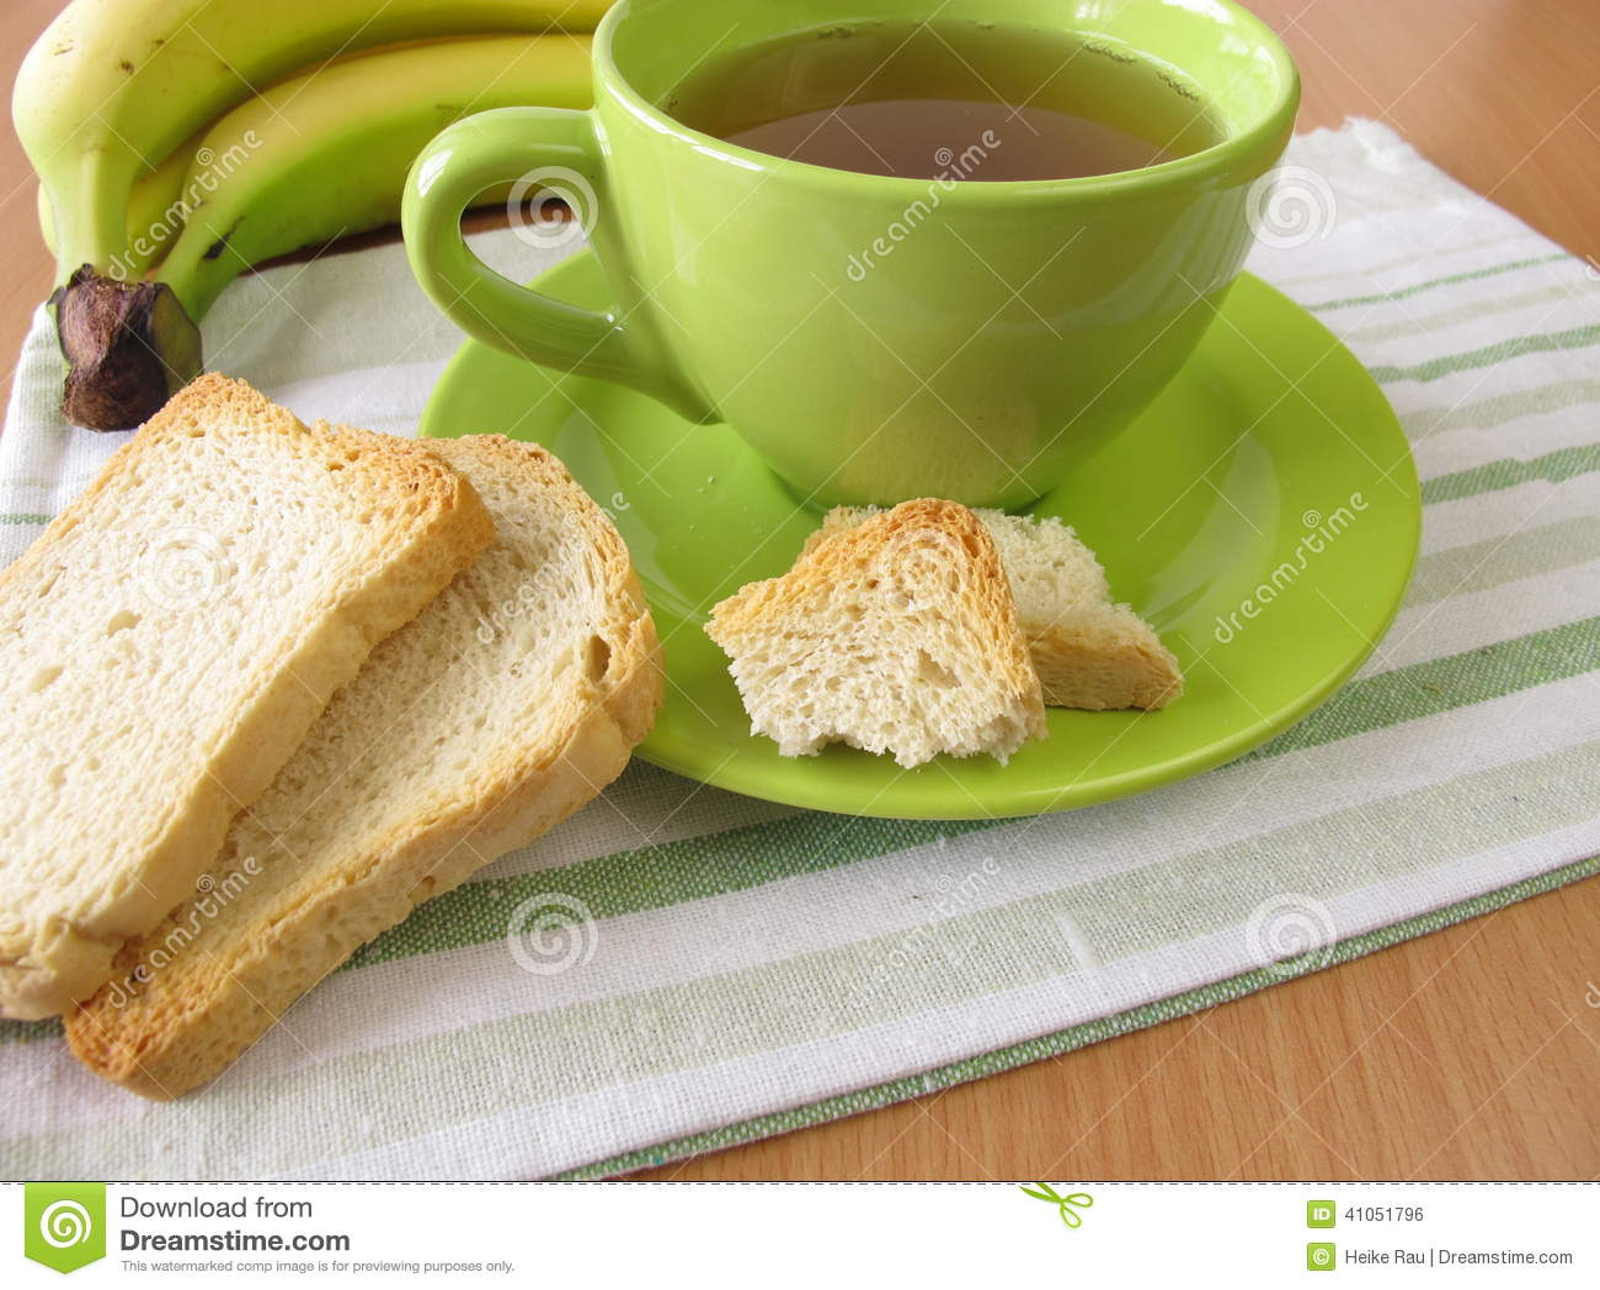 Tea and twice baked crisp bread and banana